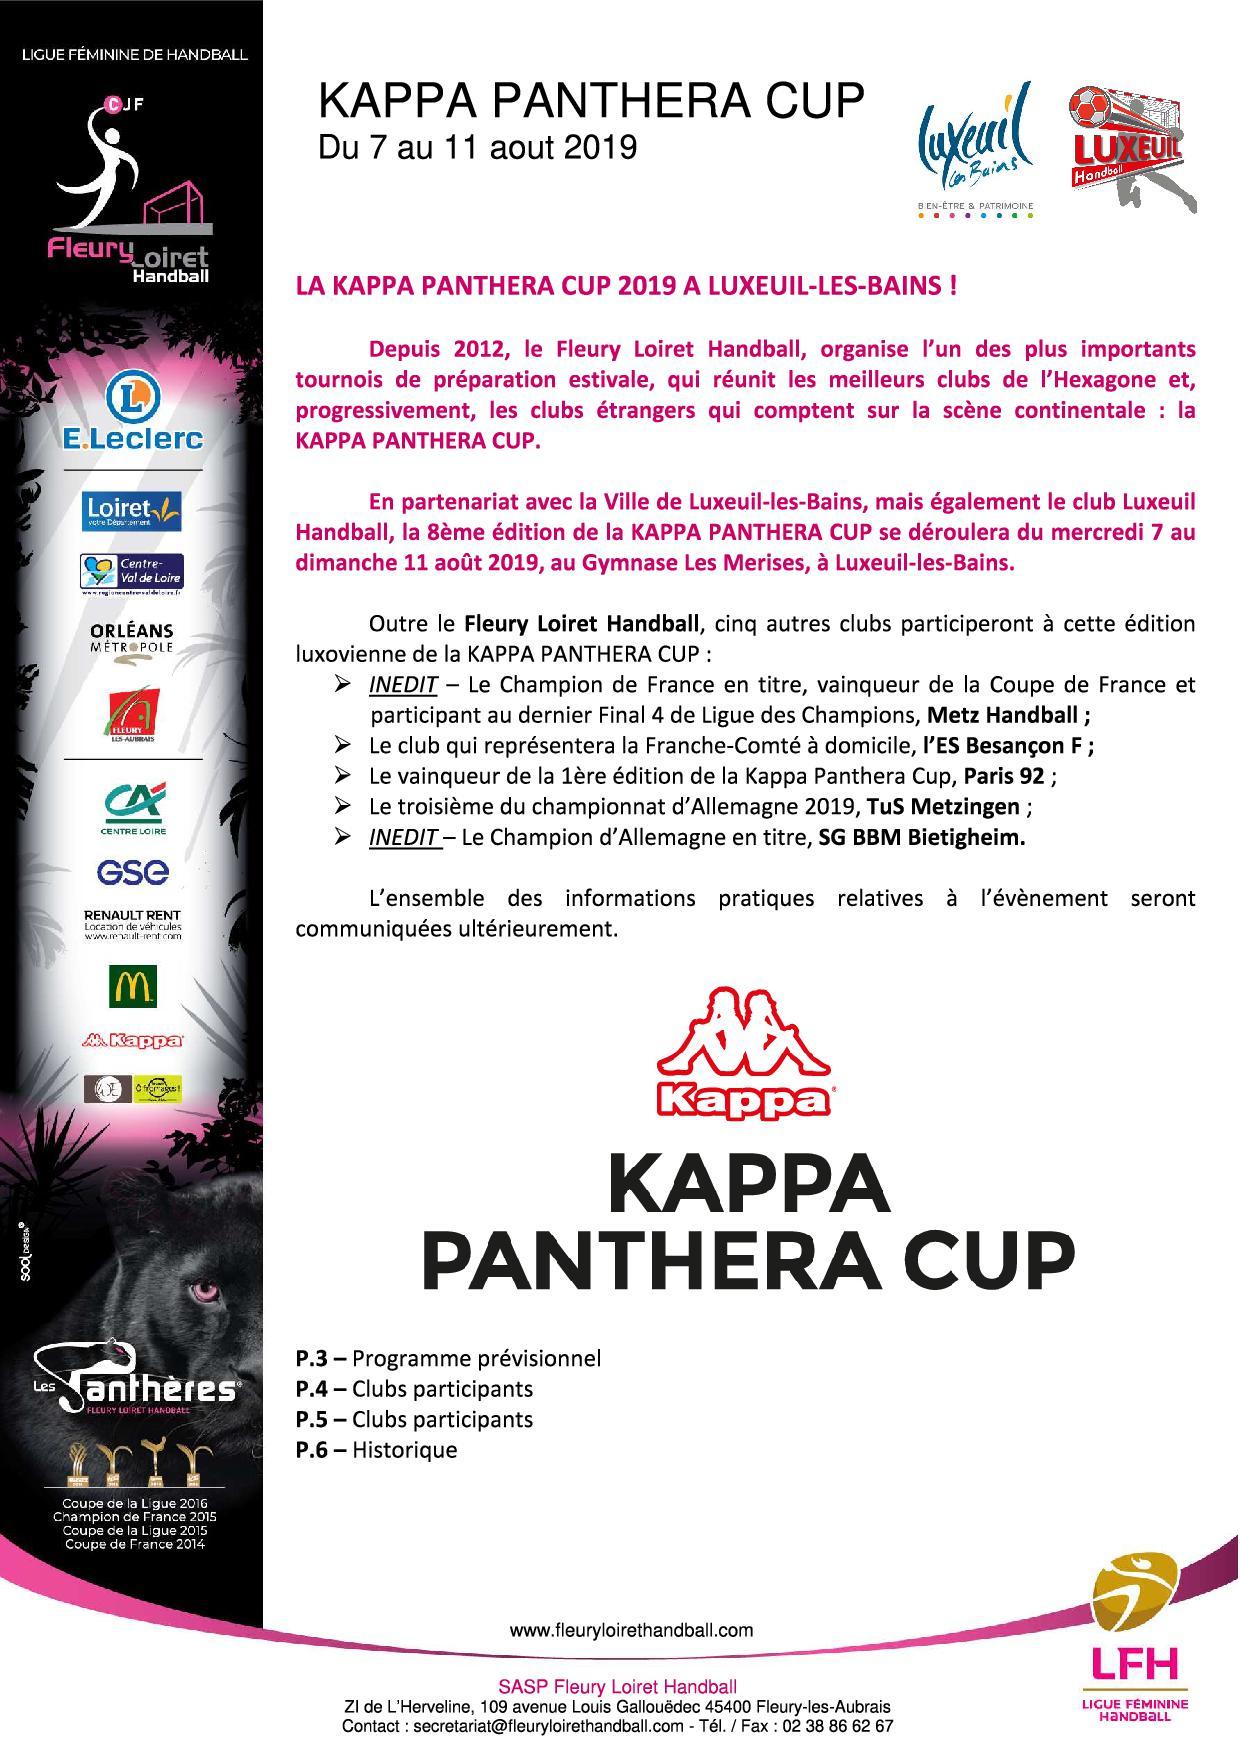 Communiqué Fleury Loiret Handball - Jeudi 20 juin 2019 - Communiqué Fleury Loiret Handball - Jeudi 20 juin 20192.jpg